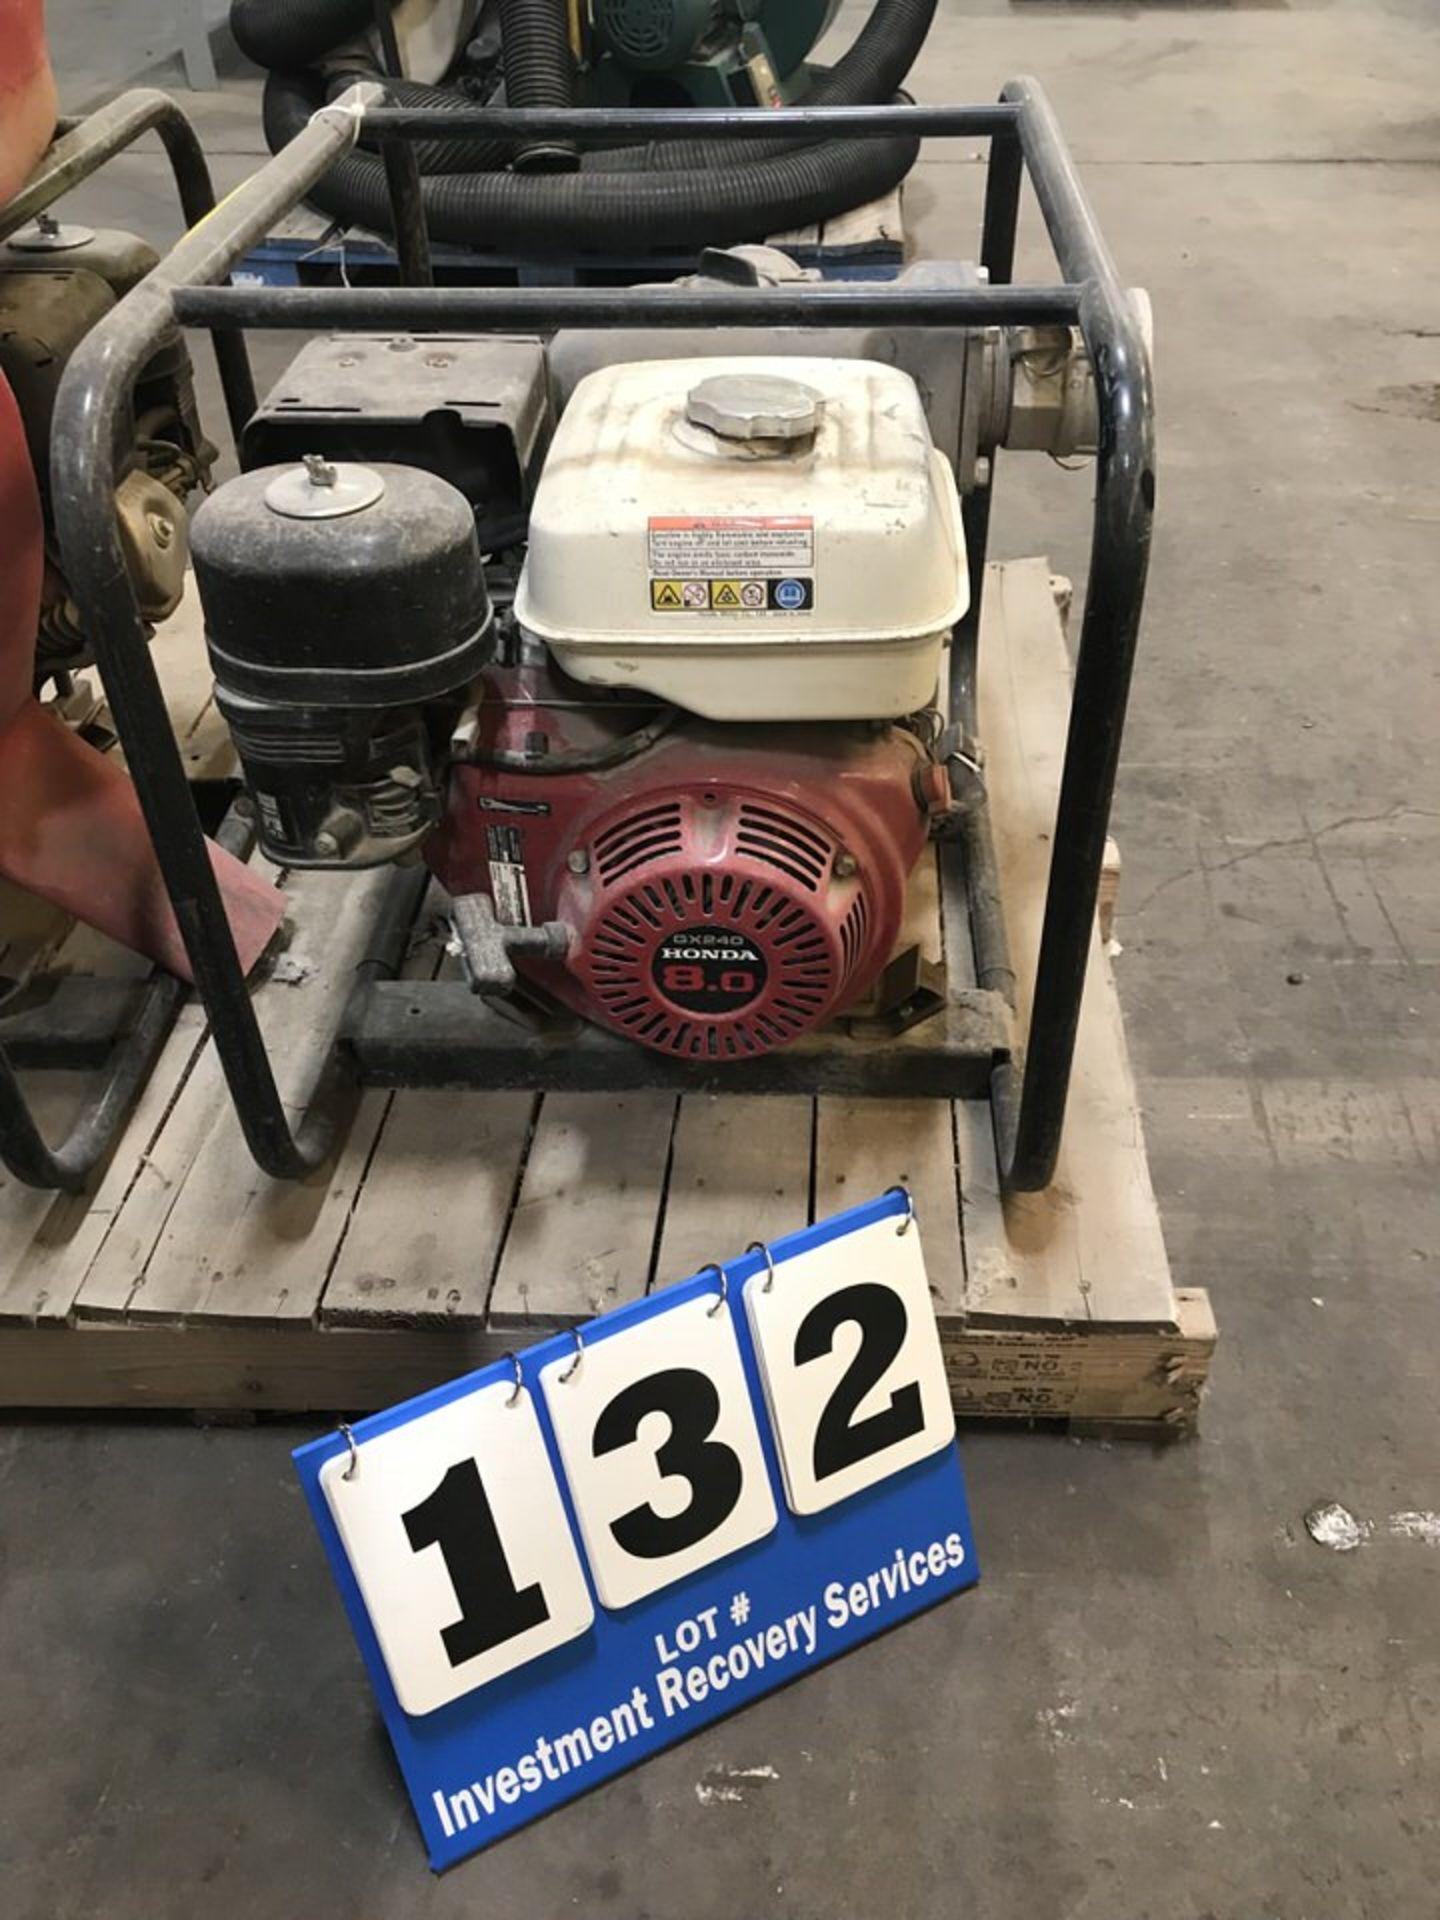 Lot 132 - Honda GX240 Pump (LOCATION: 3421 N SYLVANIA, FT WORTH, TX, 76111)